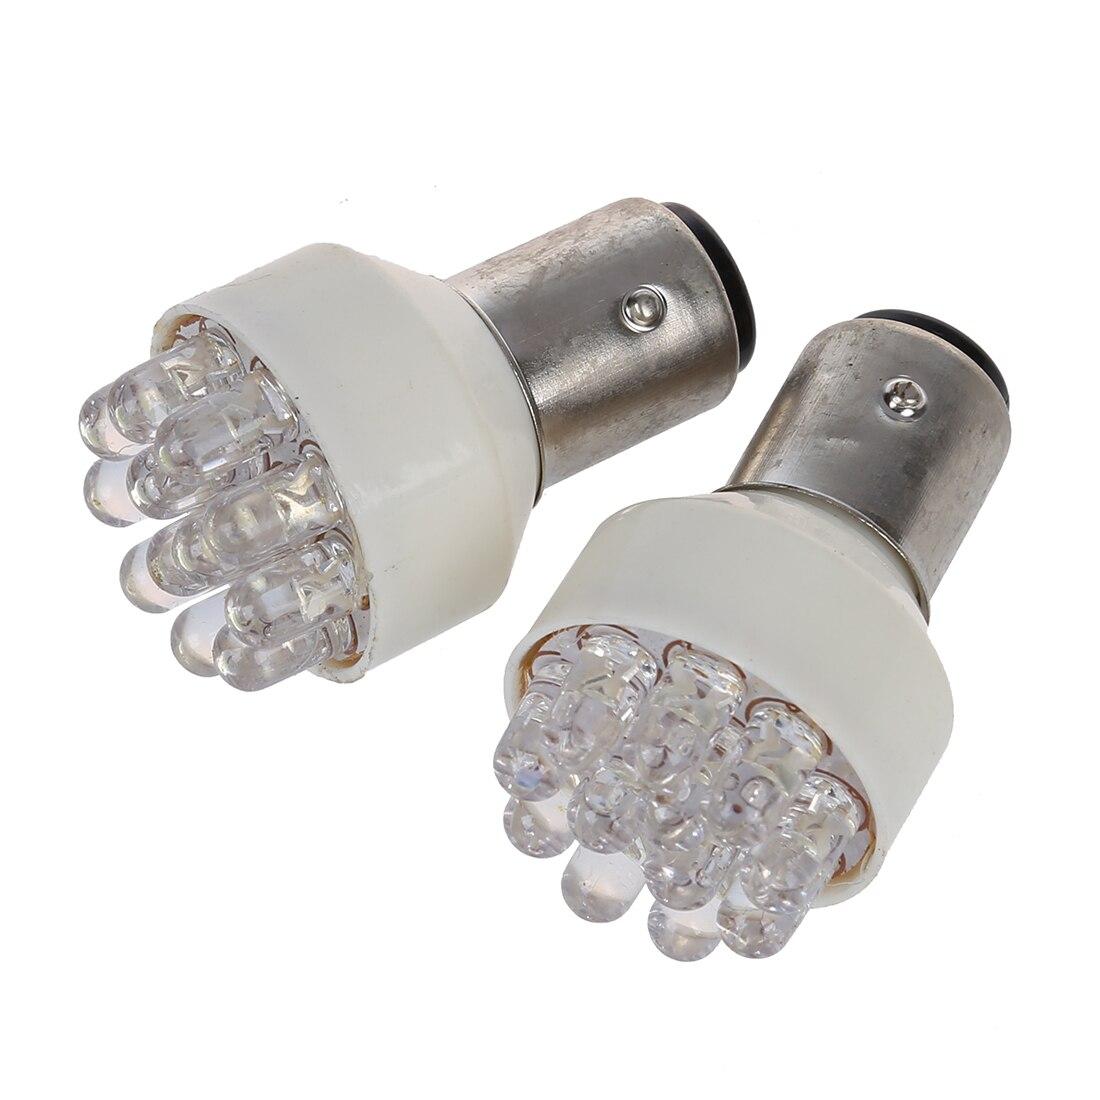 2 X BAY15D 1157 T25 12 LED Car Tail Stop Turn Signal Lights Bulbs White